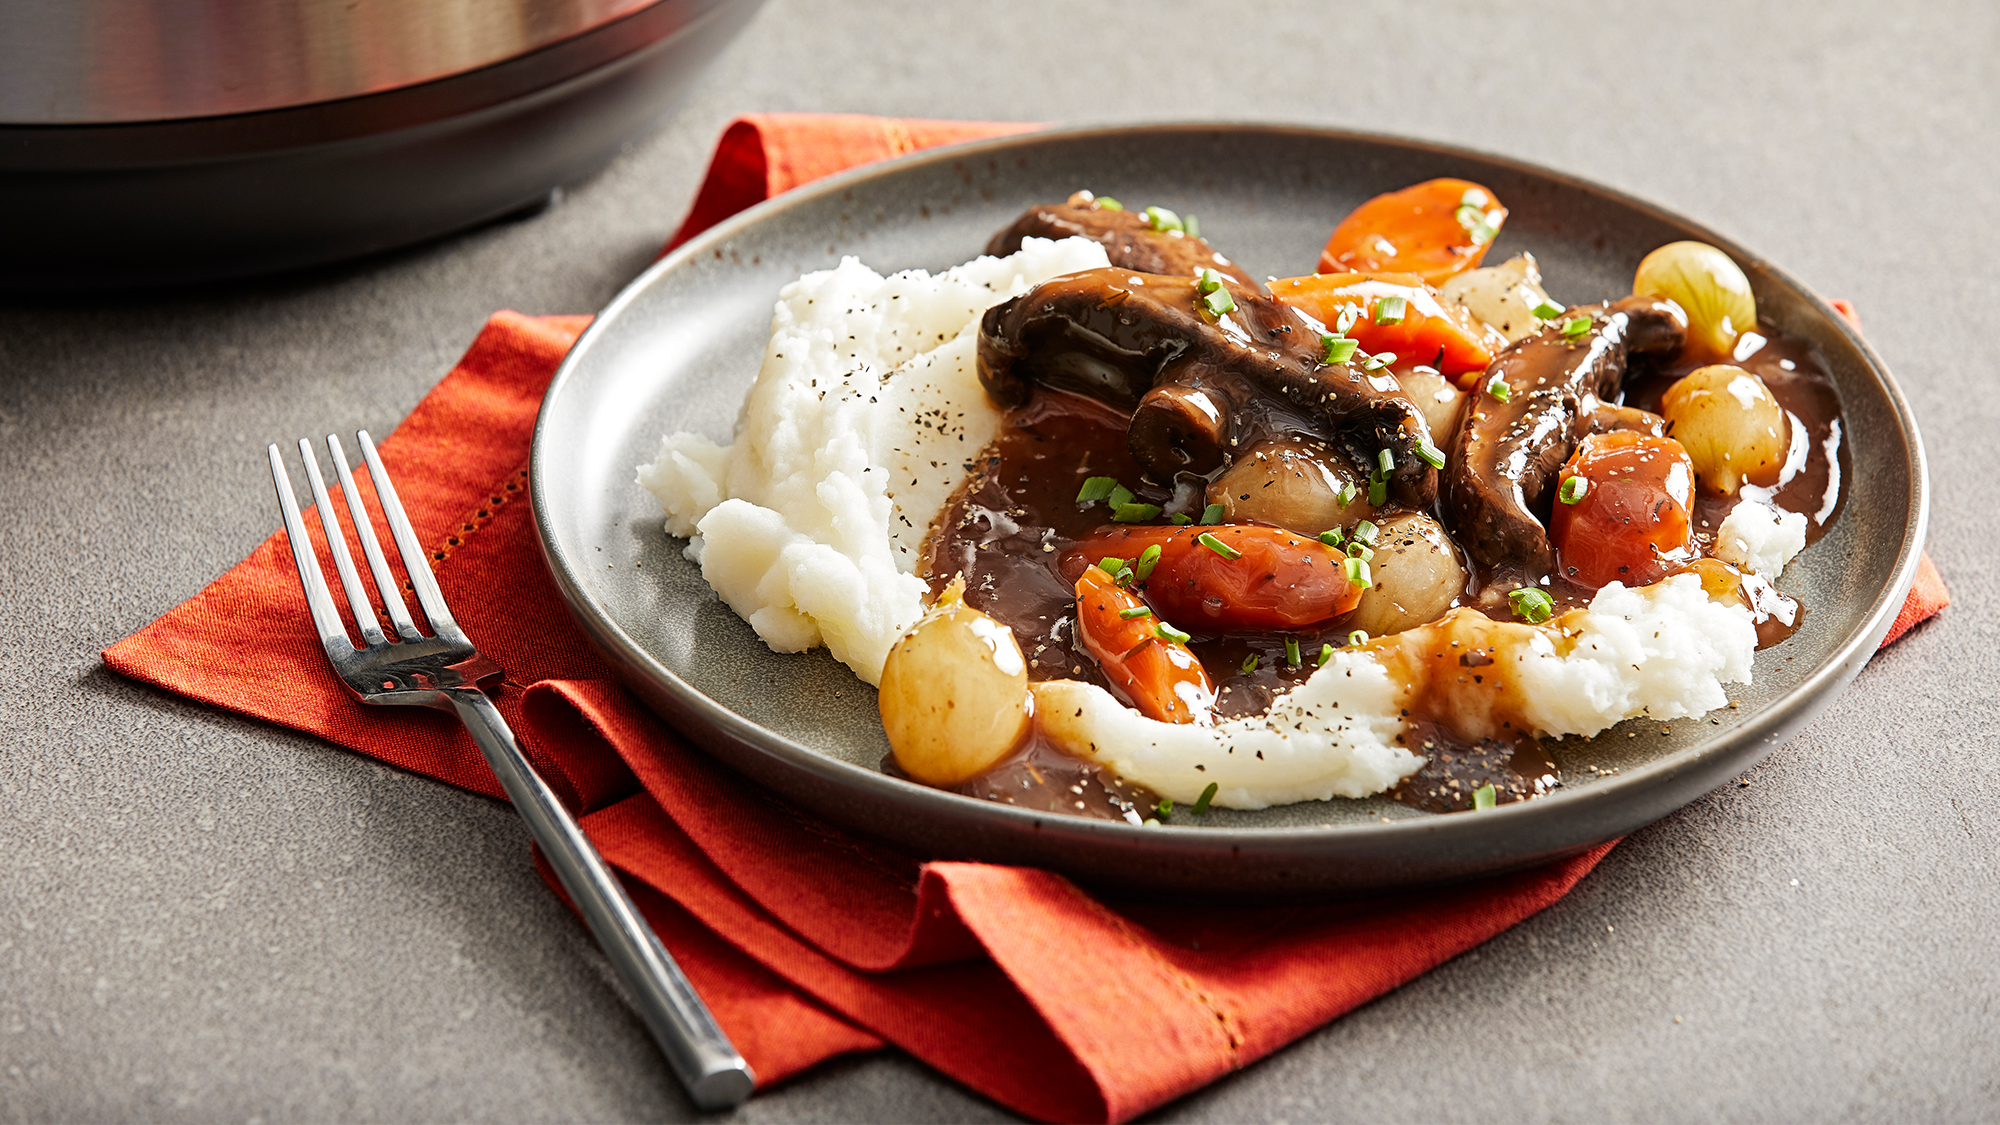 slow_cooker_vegan_portobello_pot_roast2000x1125.jpg